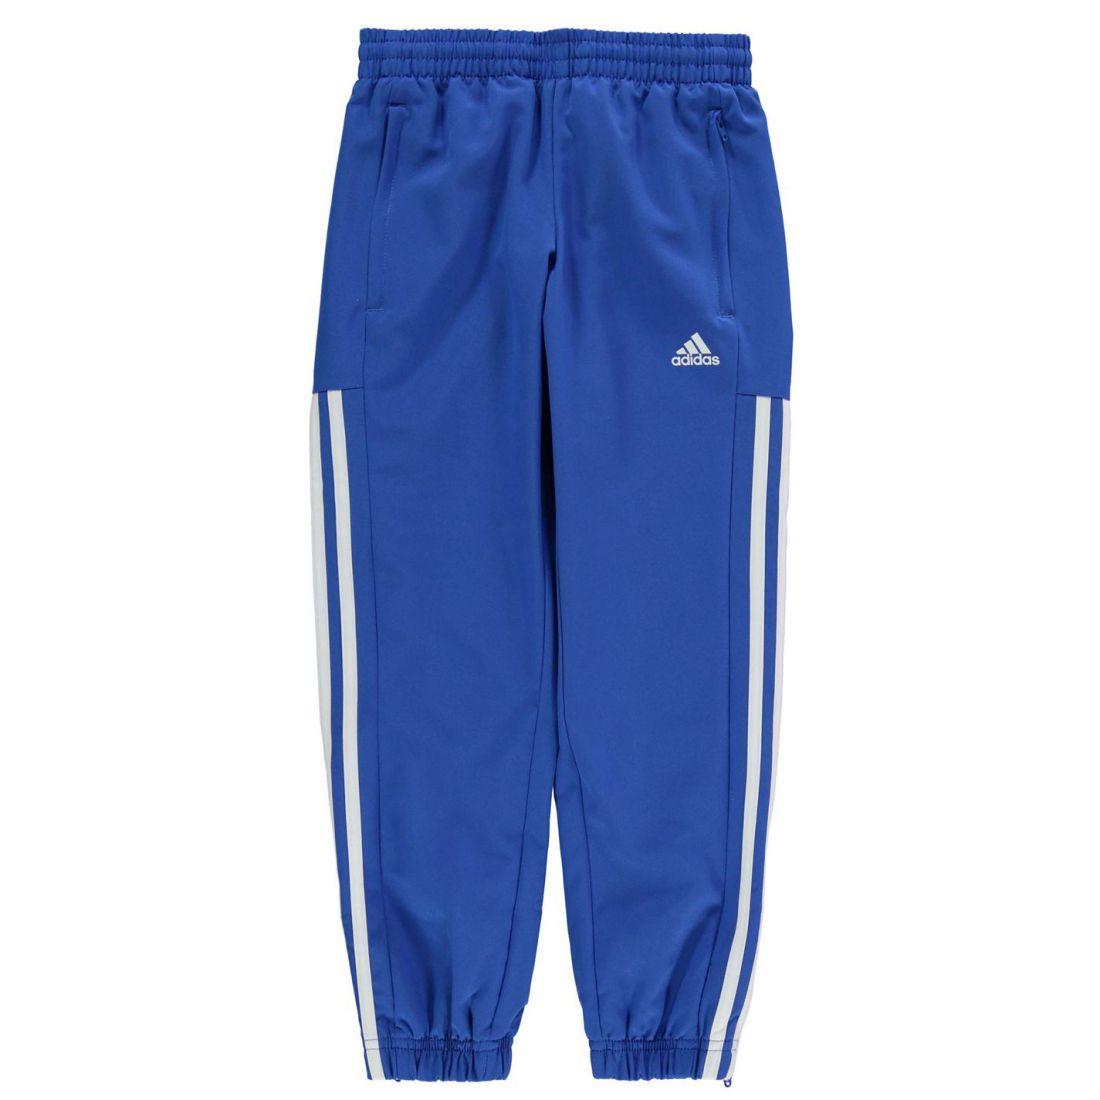 079ba30b33d2 adidas Samson 2 Sweat Pants Junior Mesh Lining Casual Boys Children 7 7 di  10 ...